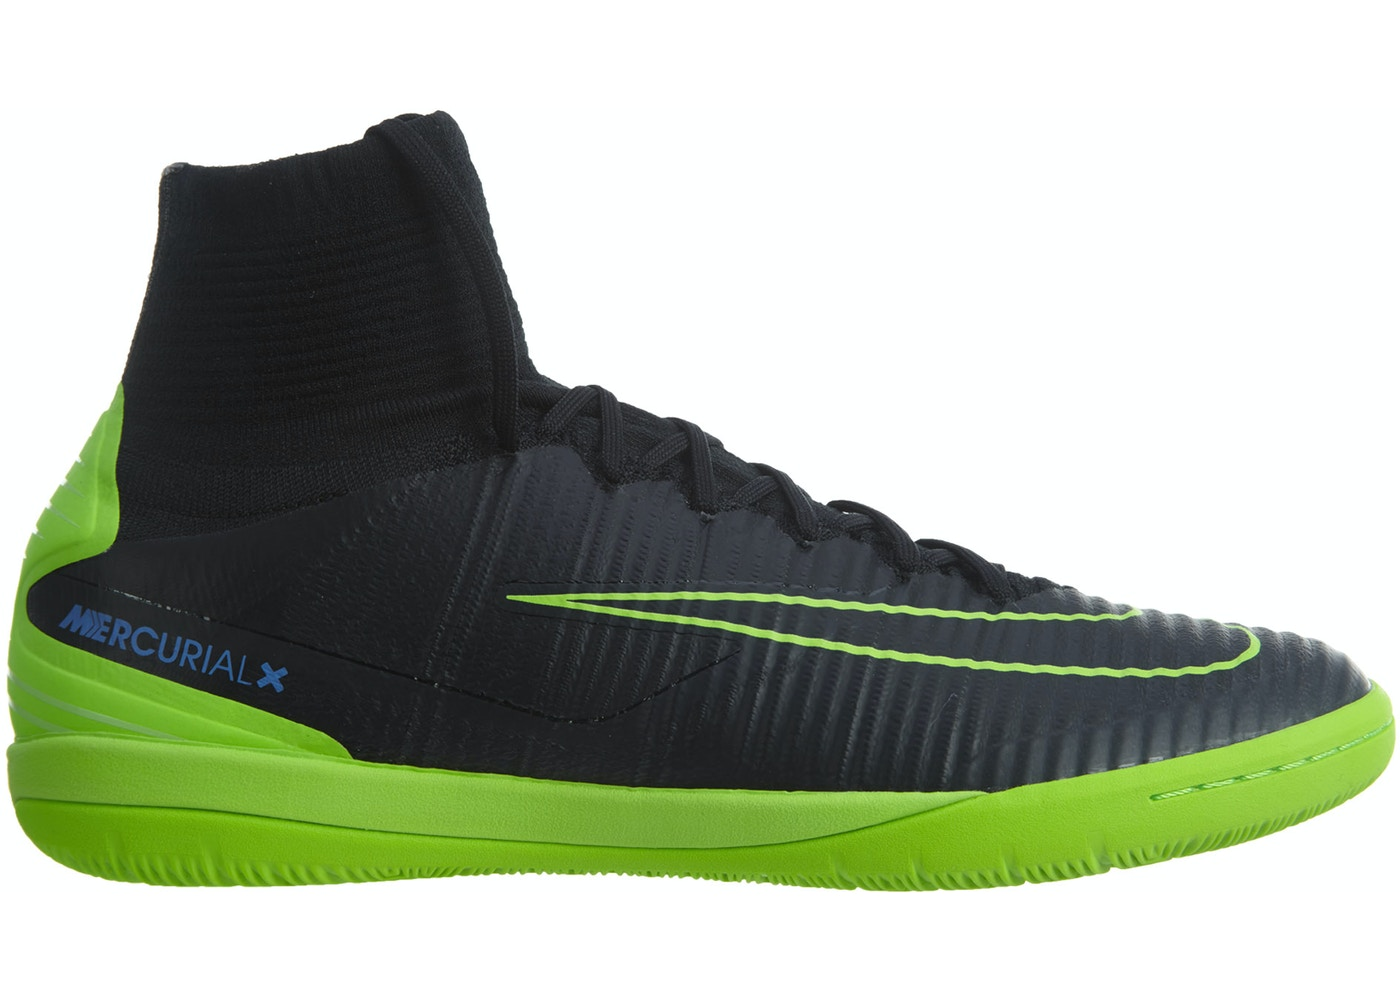 super popular fef8f 4873e Sell. or Ask. Size --. View All Bids. Nike Mercurialx Proximo II Ic Black  Electric Green